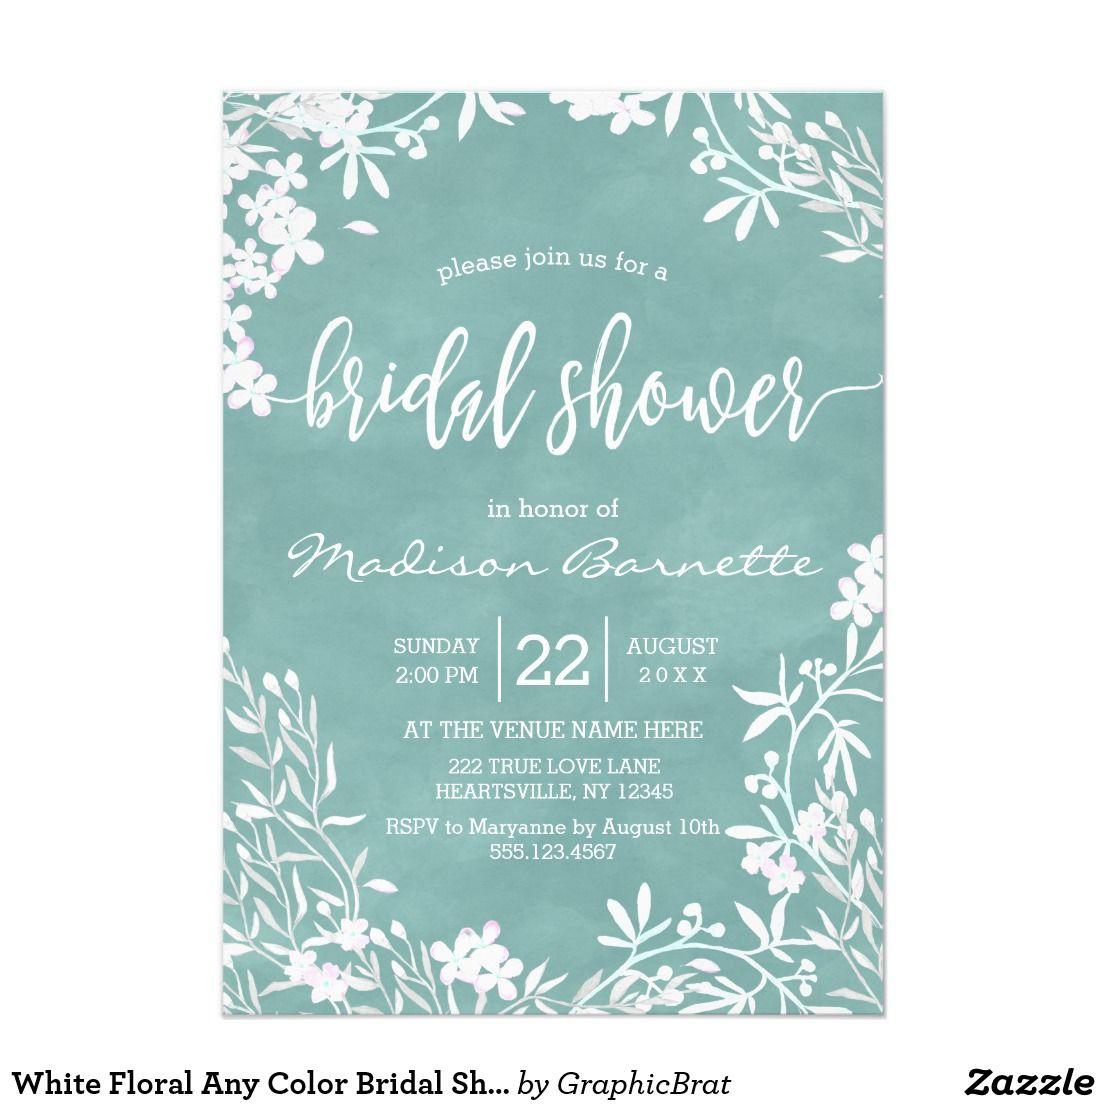 White Floral Any Color Bridal Shower Invitation Zazzle